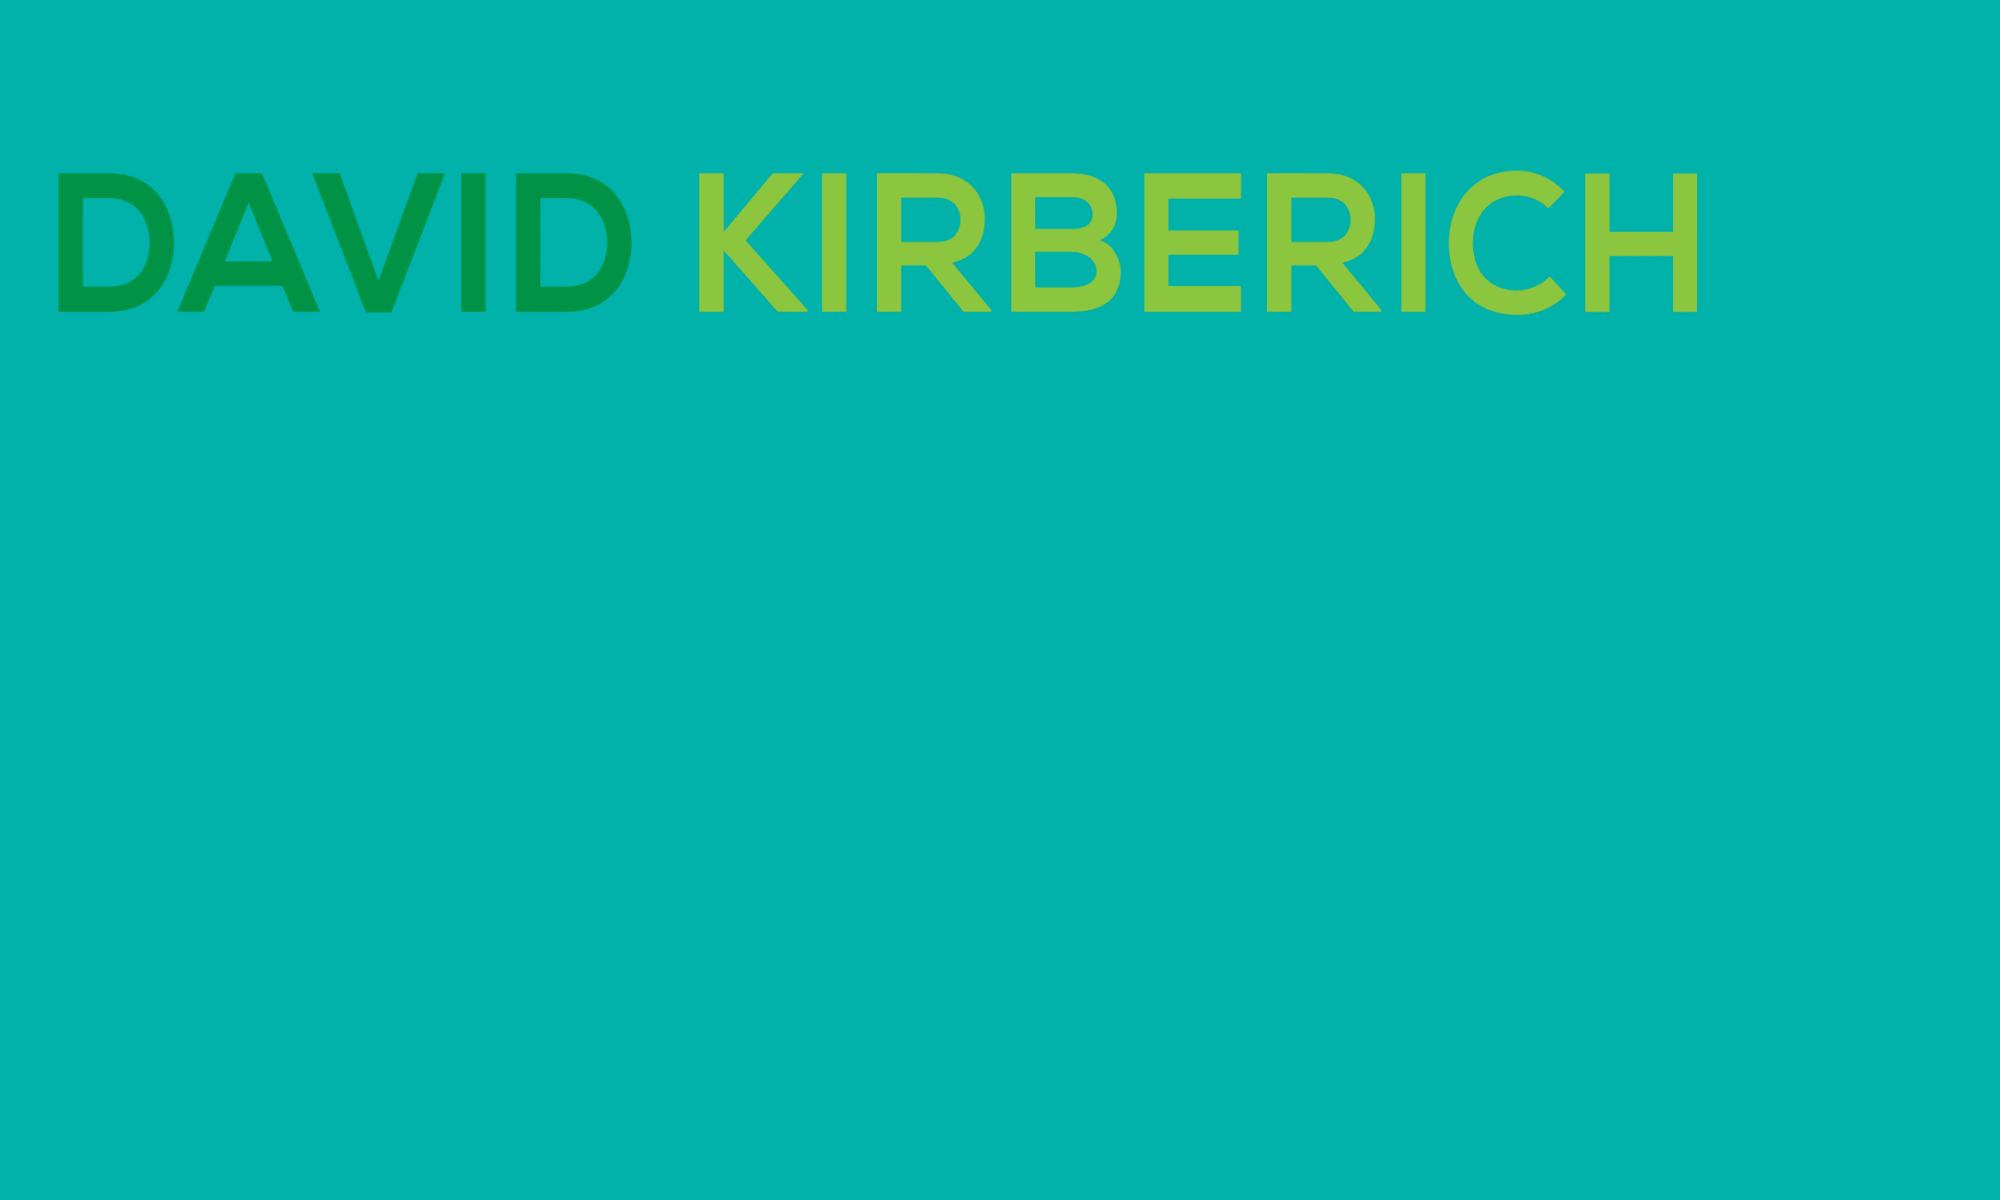 David Kirberich